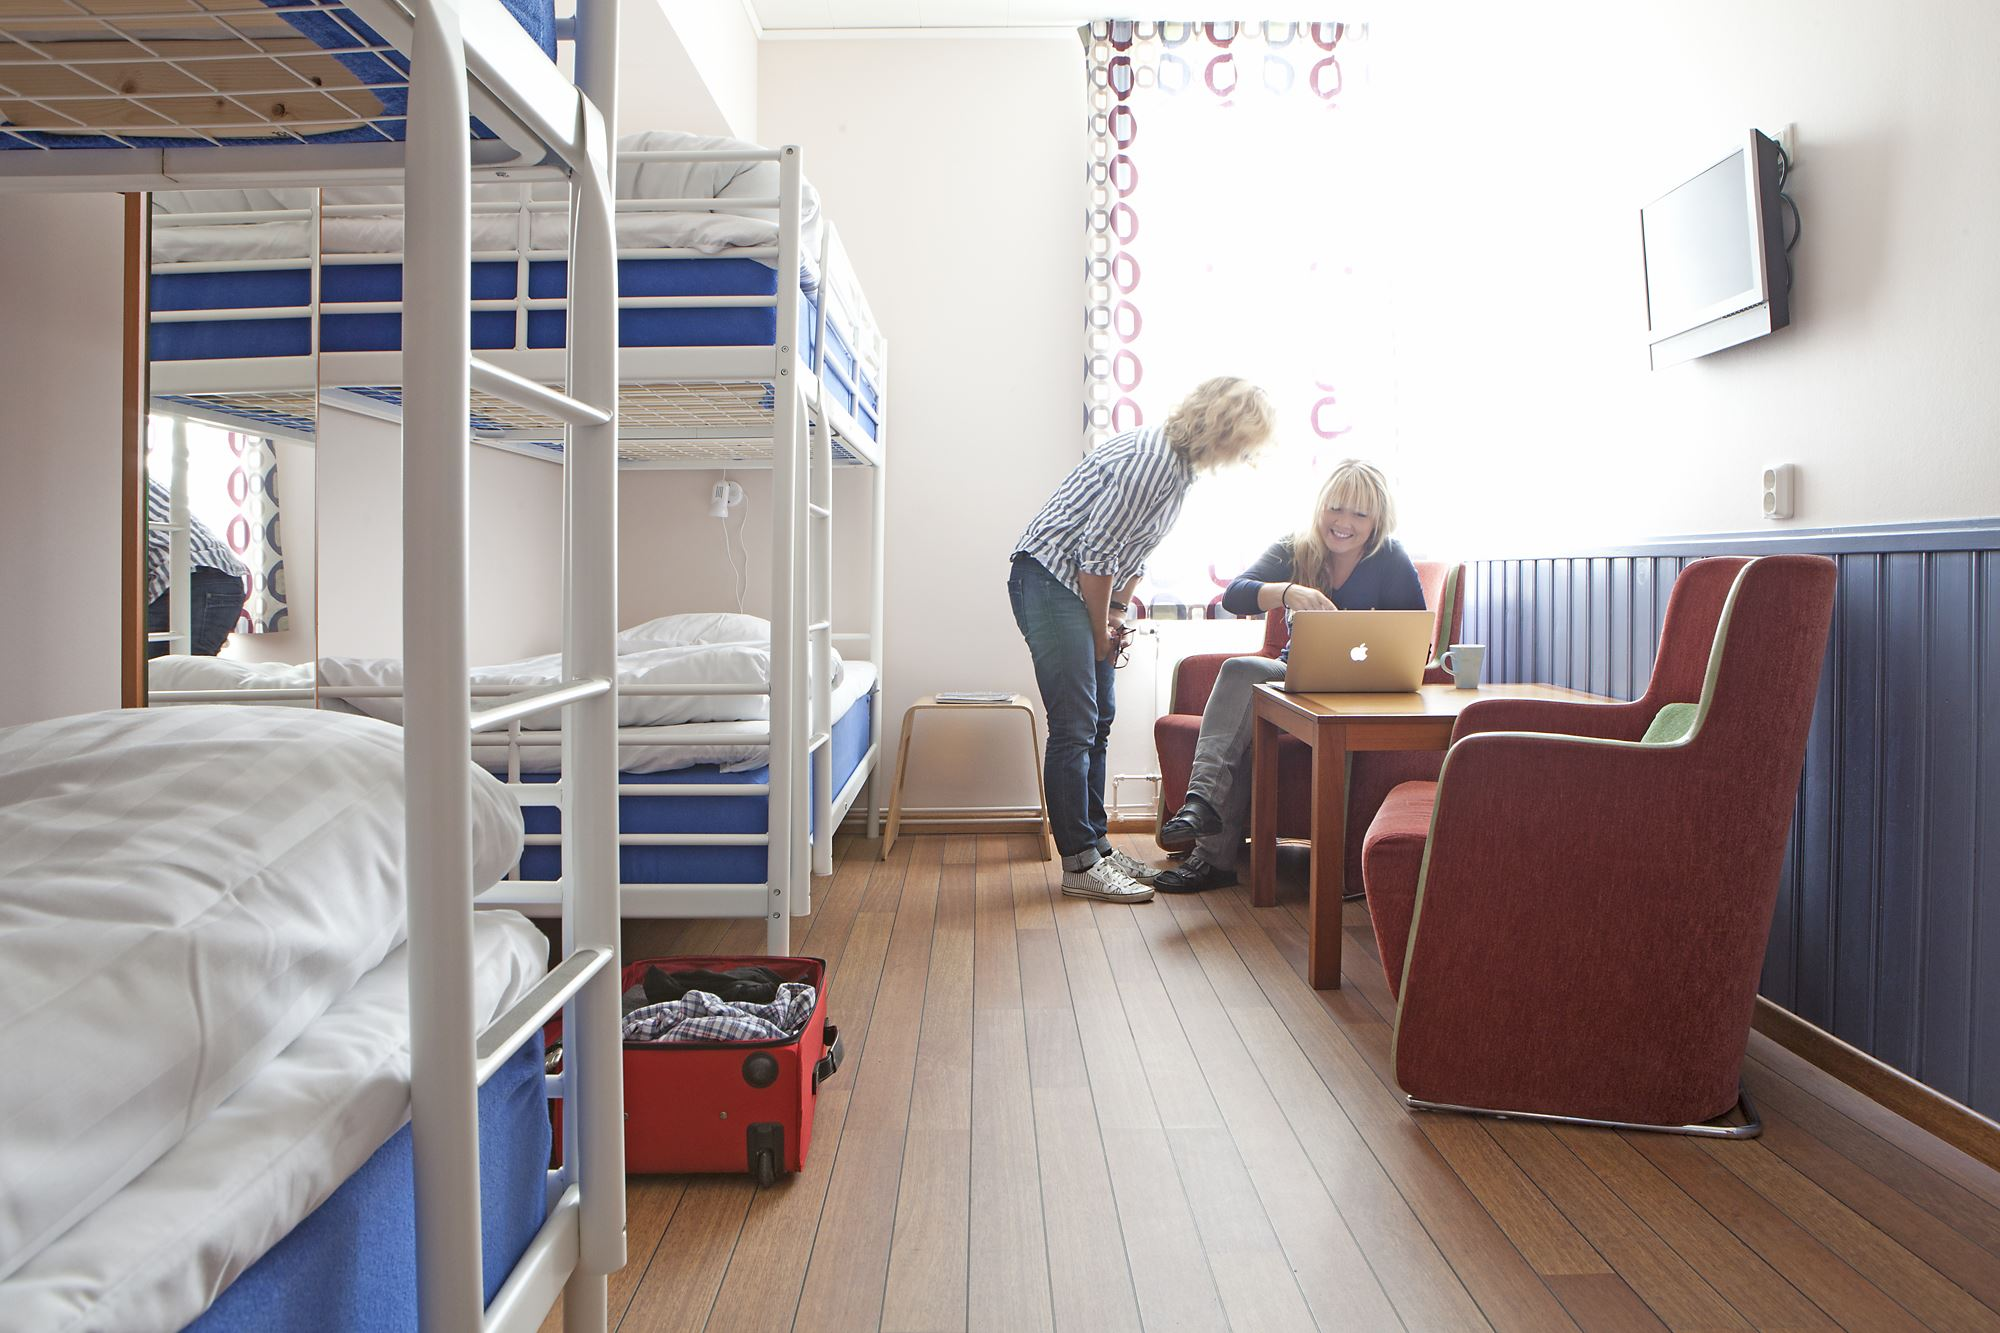 Kvibergs Vandrarhem i Göteborg, SVIF